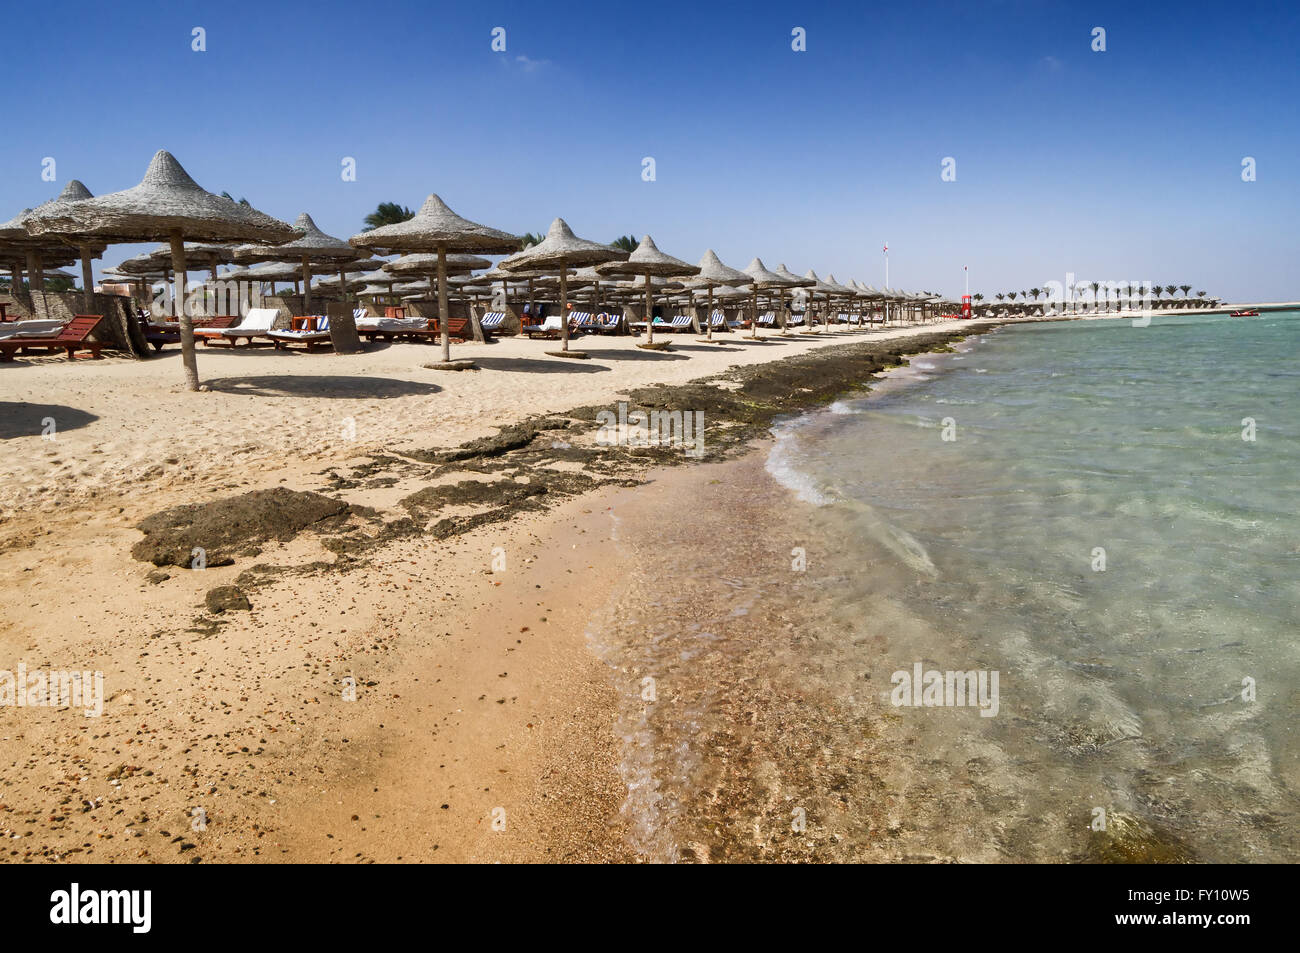 Marsa Alam beach with row of umbrella, Egypt - Stock Image